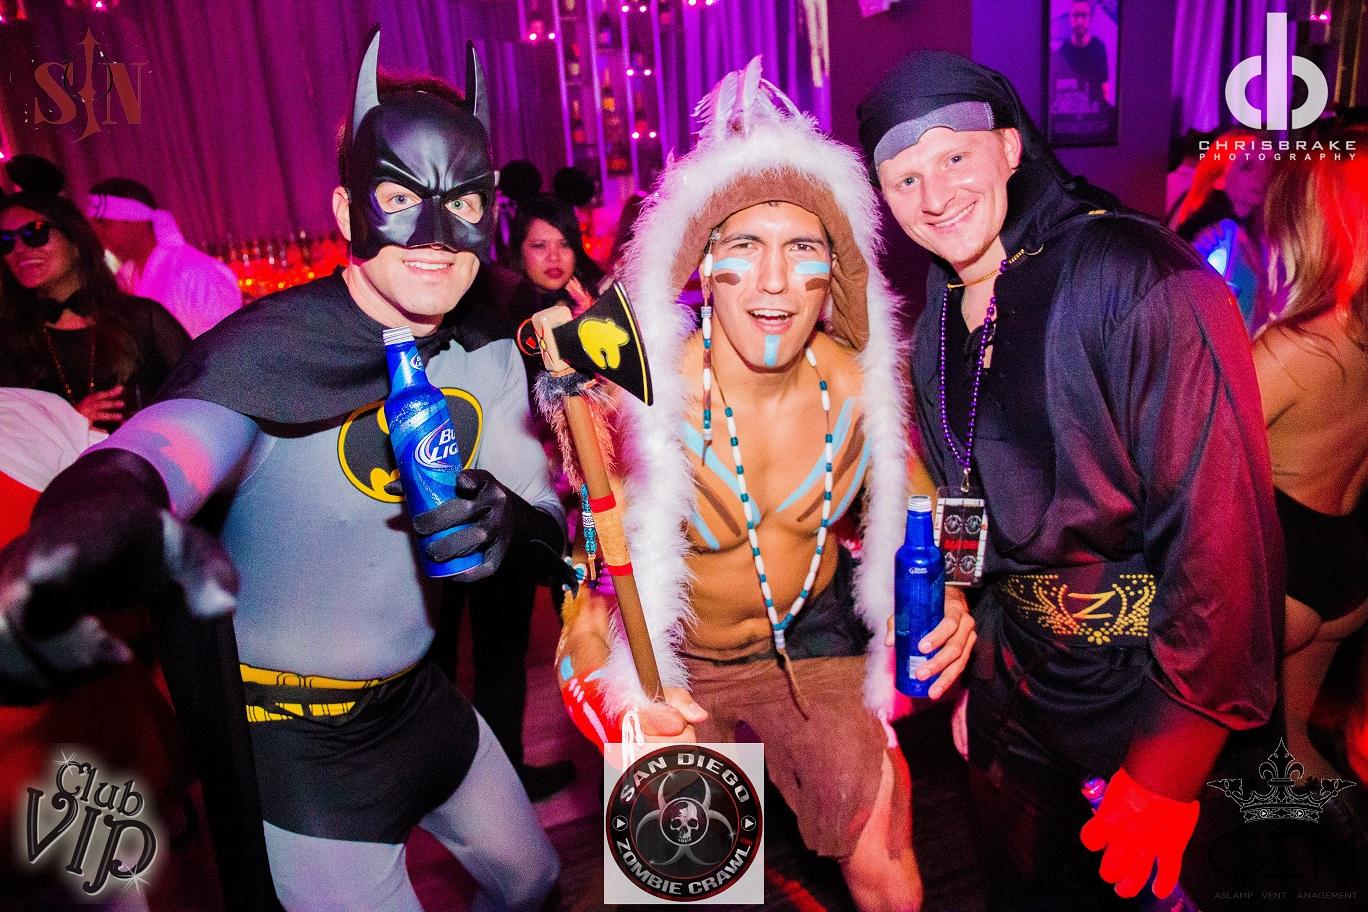 SAN DIEGO ZOMBIE CRAWL 2016 - Tickets - Begins at Fluxx Nightclub ...